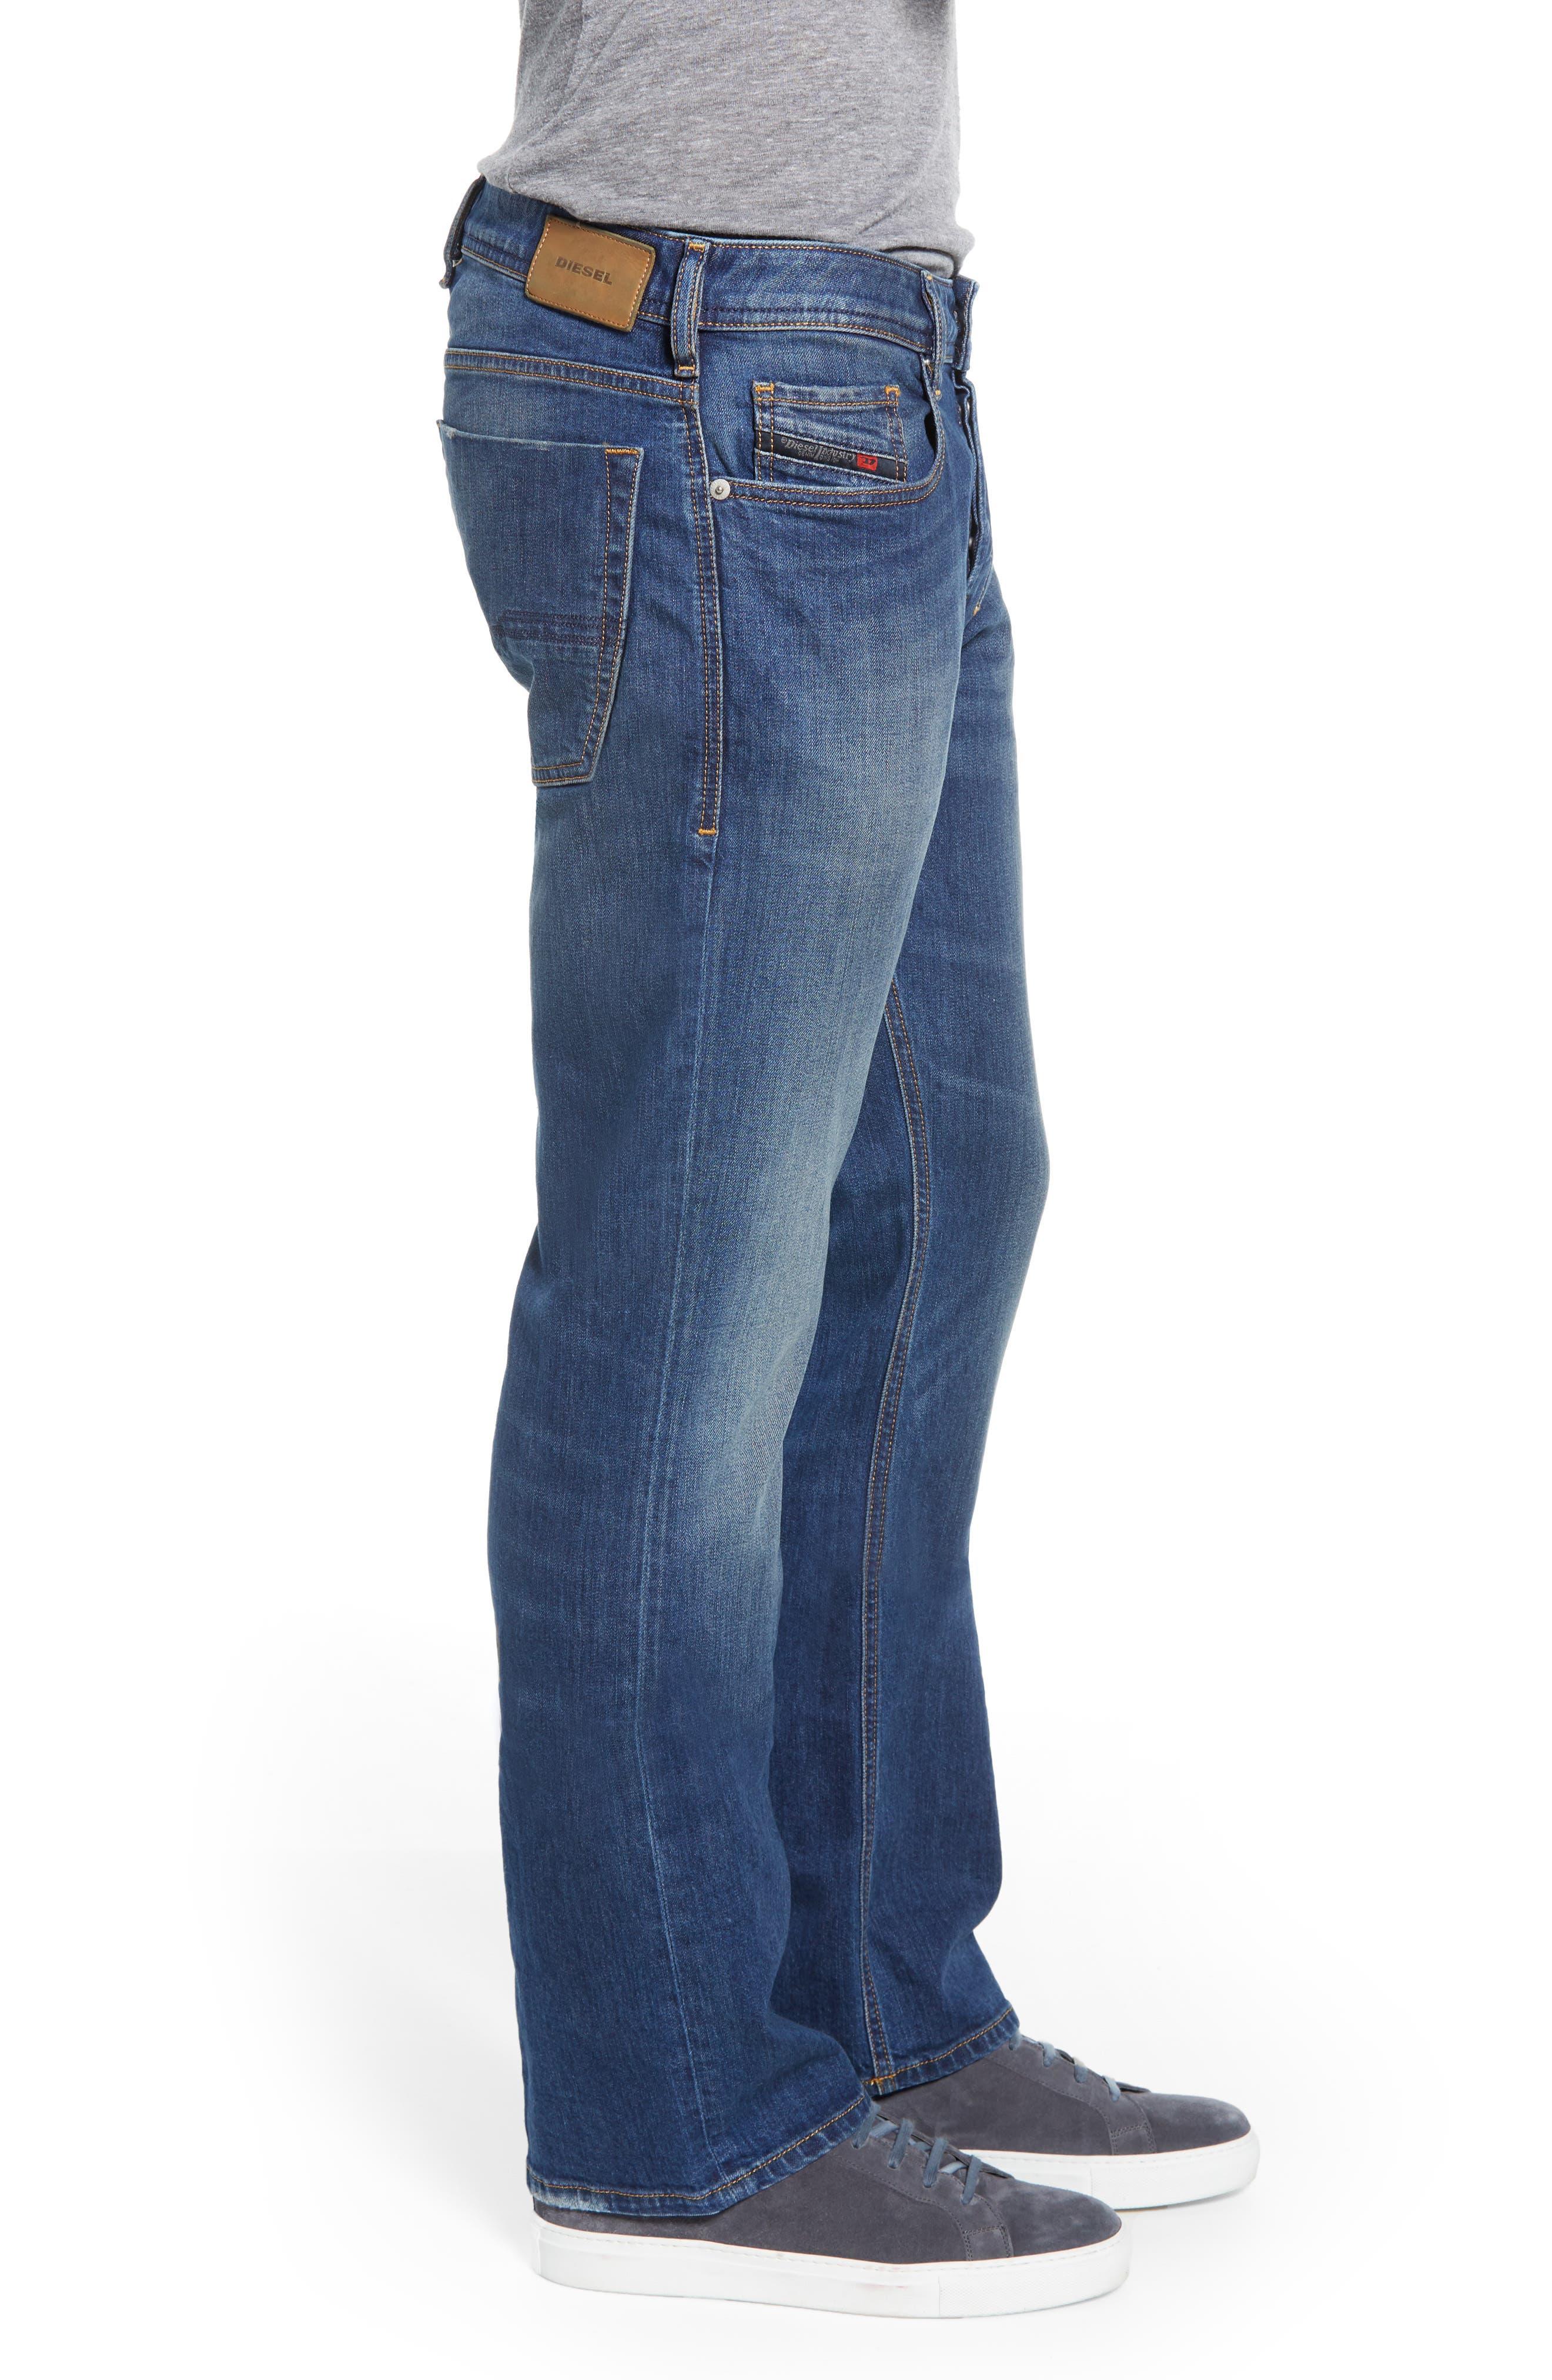 DIESEL<SUP>®</SUP>, Zatiny Bootcut Jeans, Alternate thumbnail 4, color, DENIM